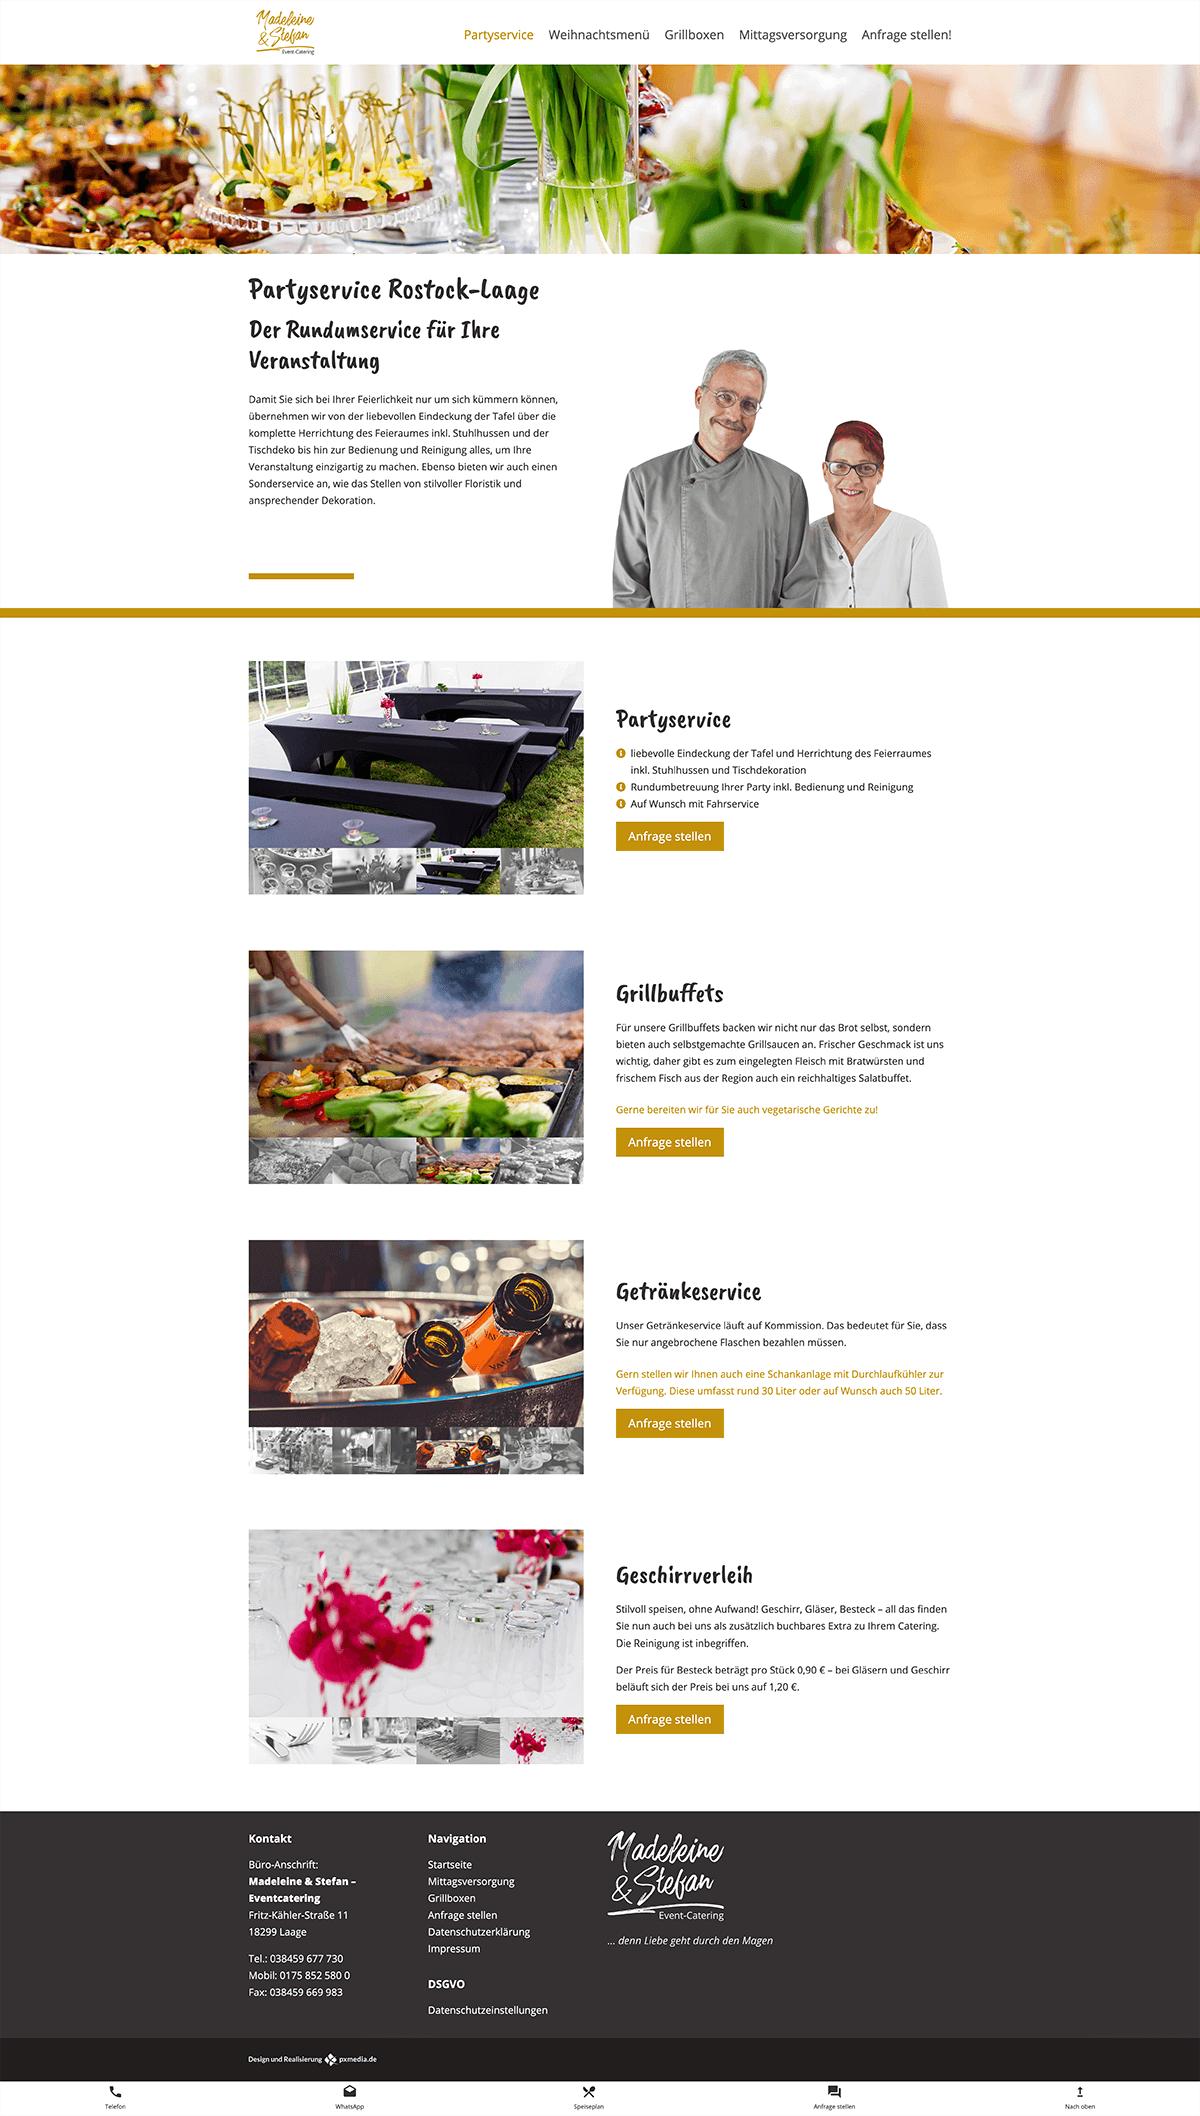 Party service webdesign